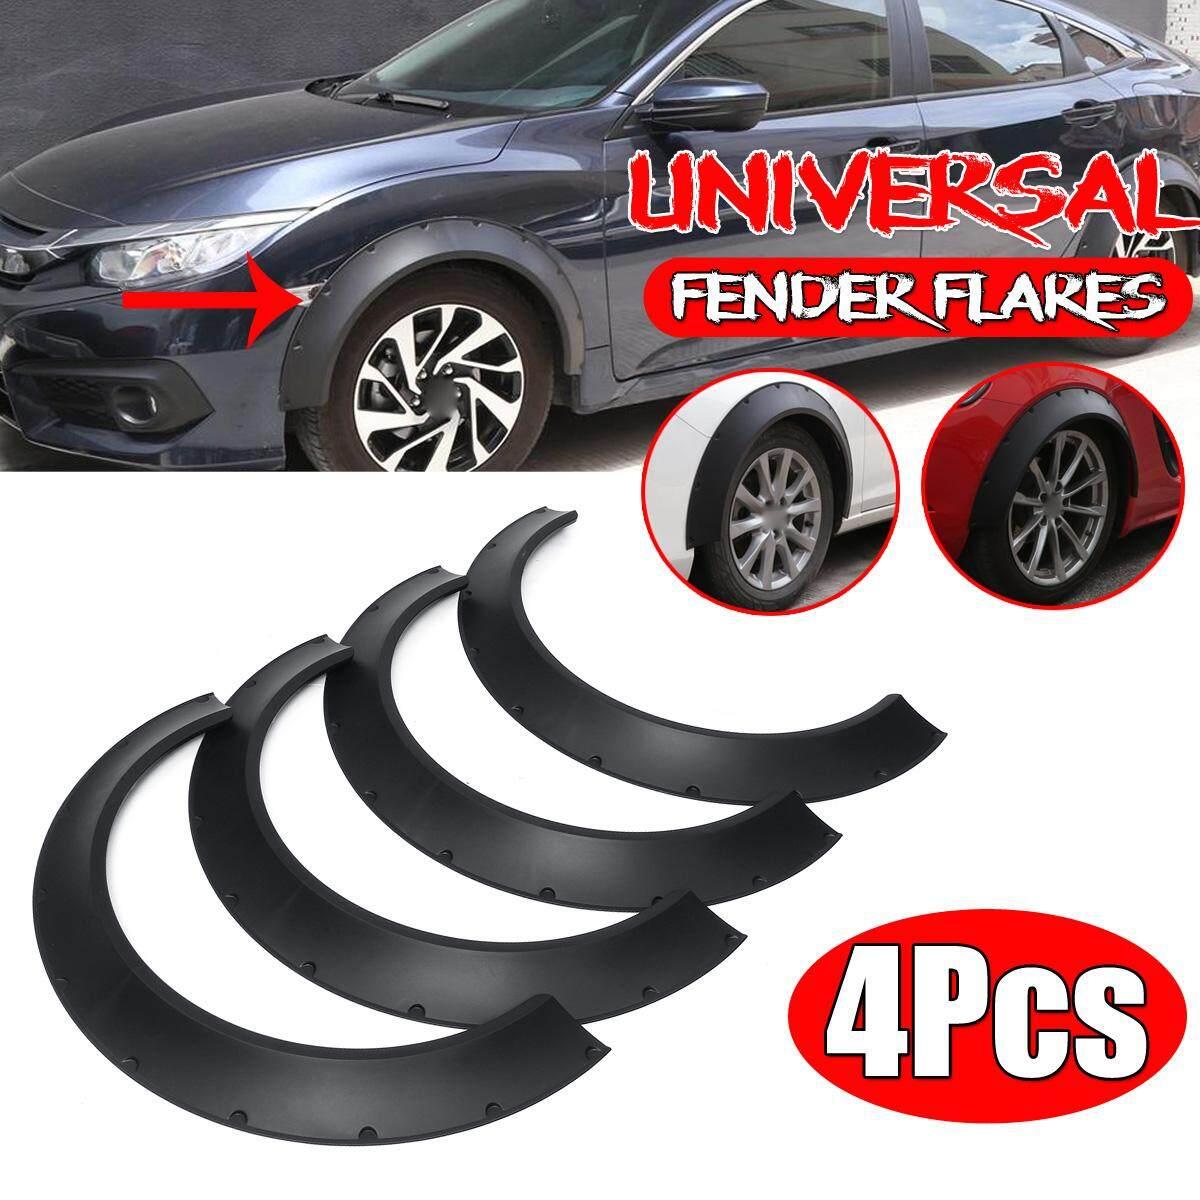 4PC Universal Black Flexible Durable Car Fender Flares Extra Wide Wheel Body Kit